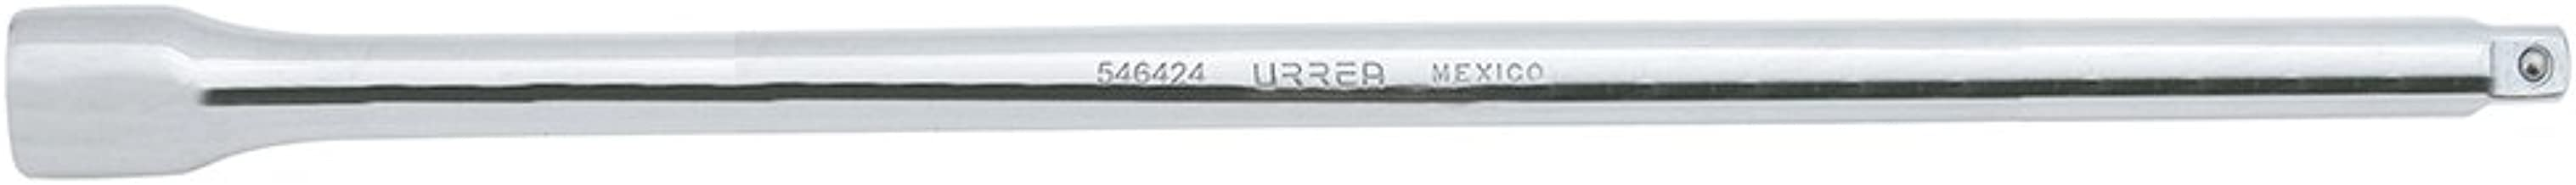 URREA Socket Wrench Extension - 1/2